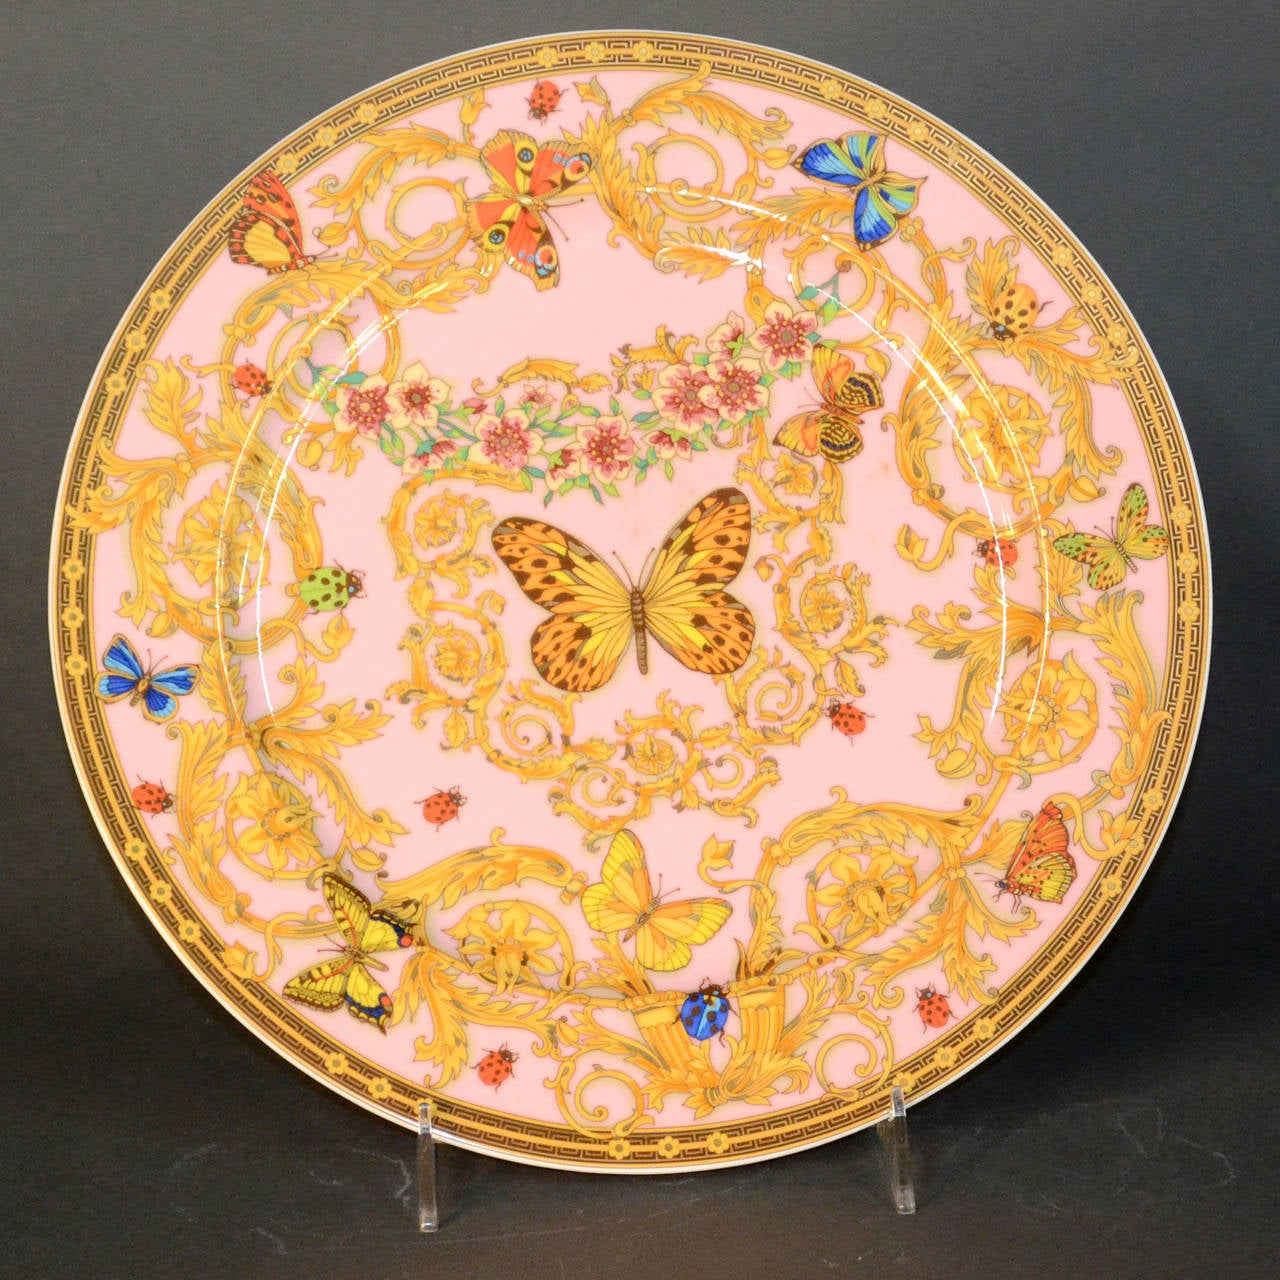 Late 20th Century Le Jardin de Versace China Dinnerware Set For Sale & Le Jardin de Versace China Dinnerware Set at 1stdibs